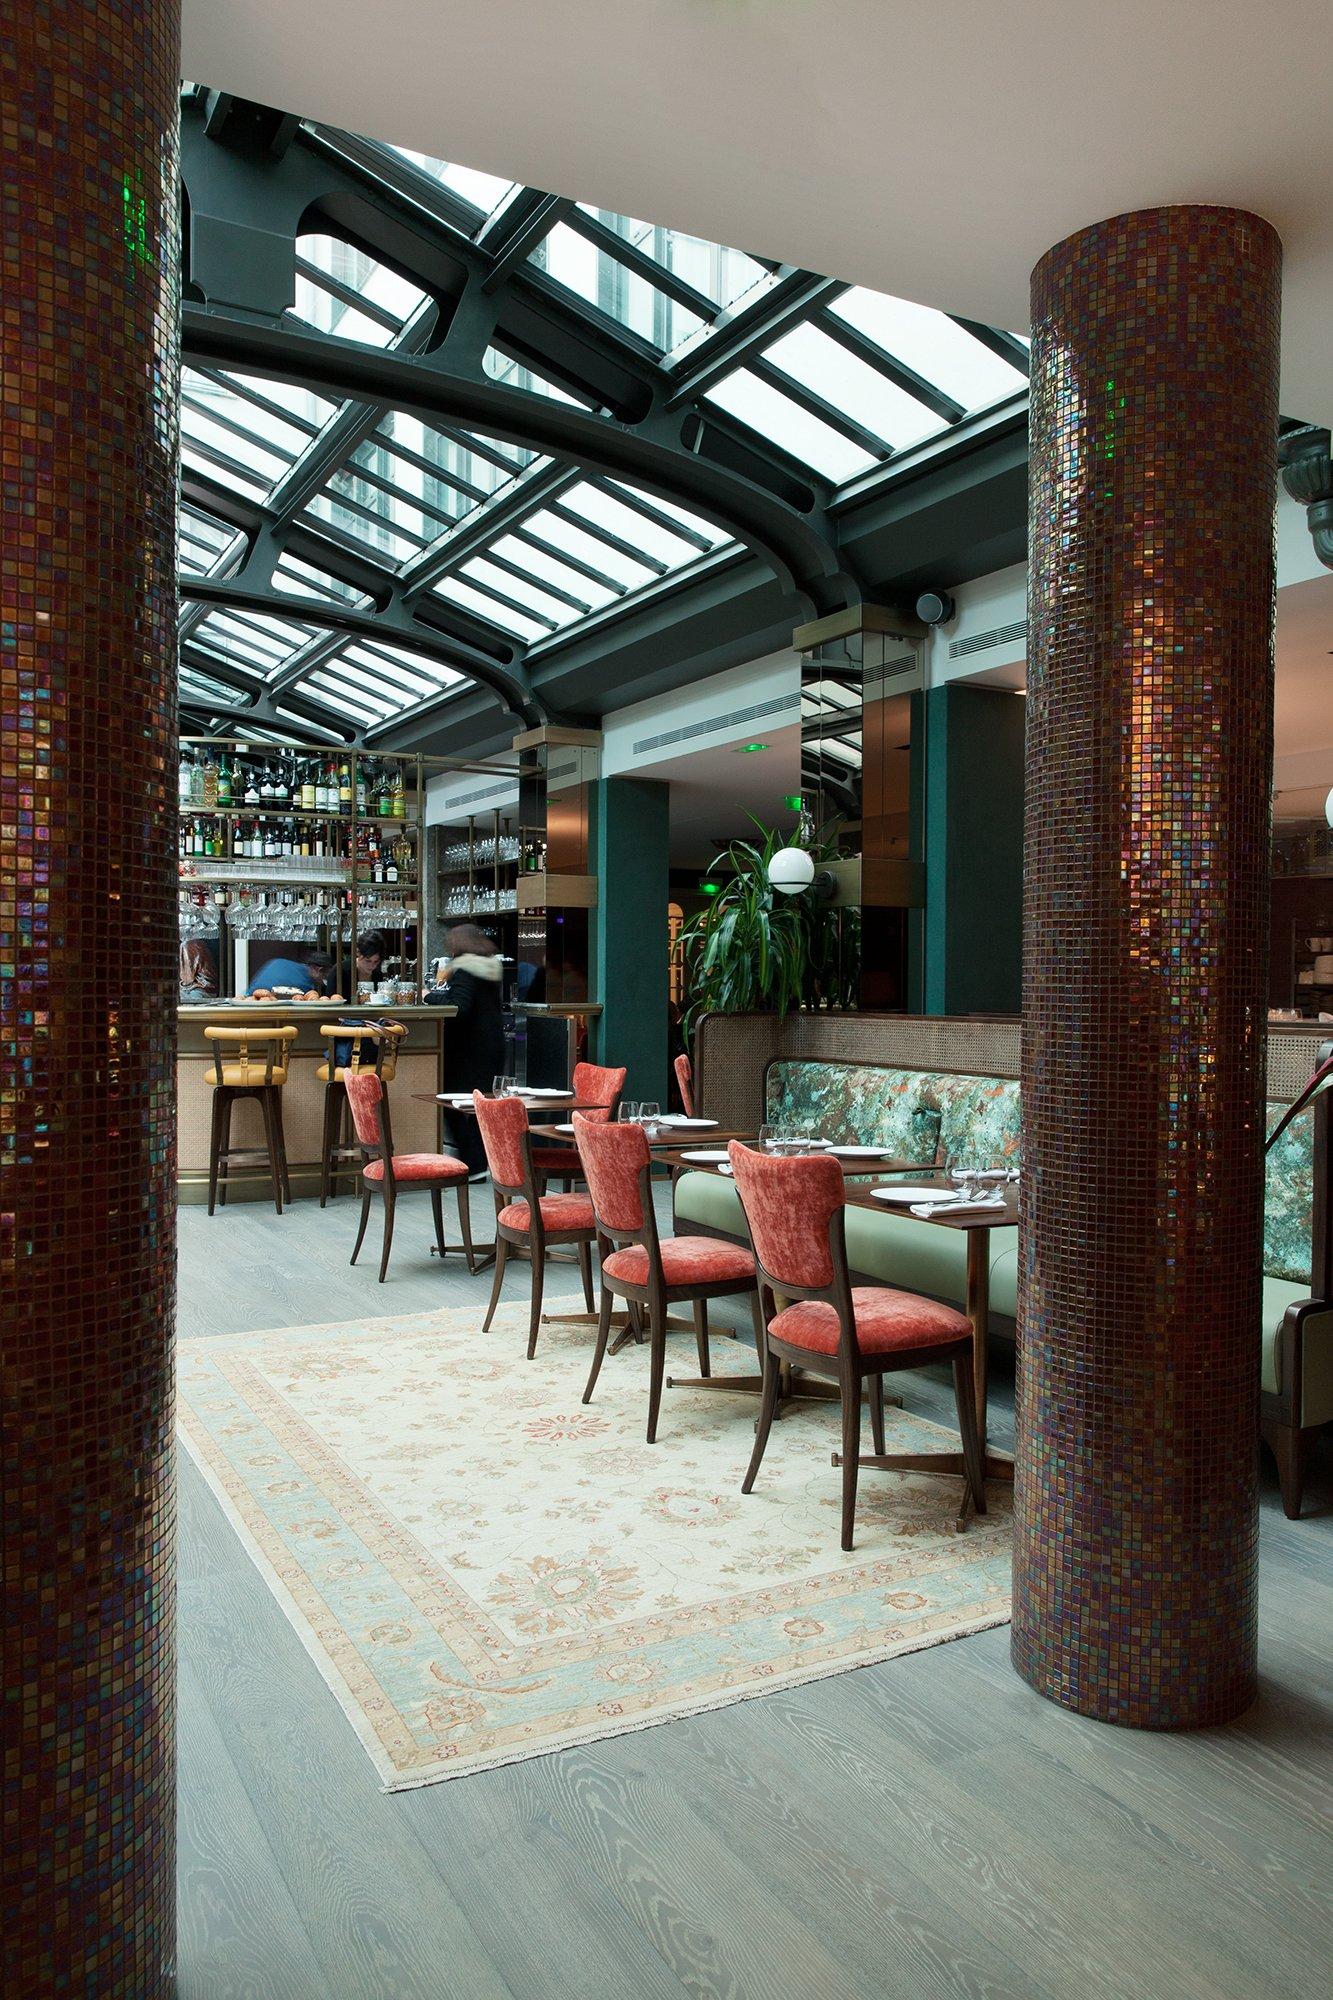 maison du monde paris bastille best galerie maison breguet with maison du monde paris bastille. Black Bedroom Furniture Sets. Home Design Ideas